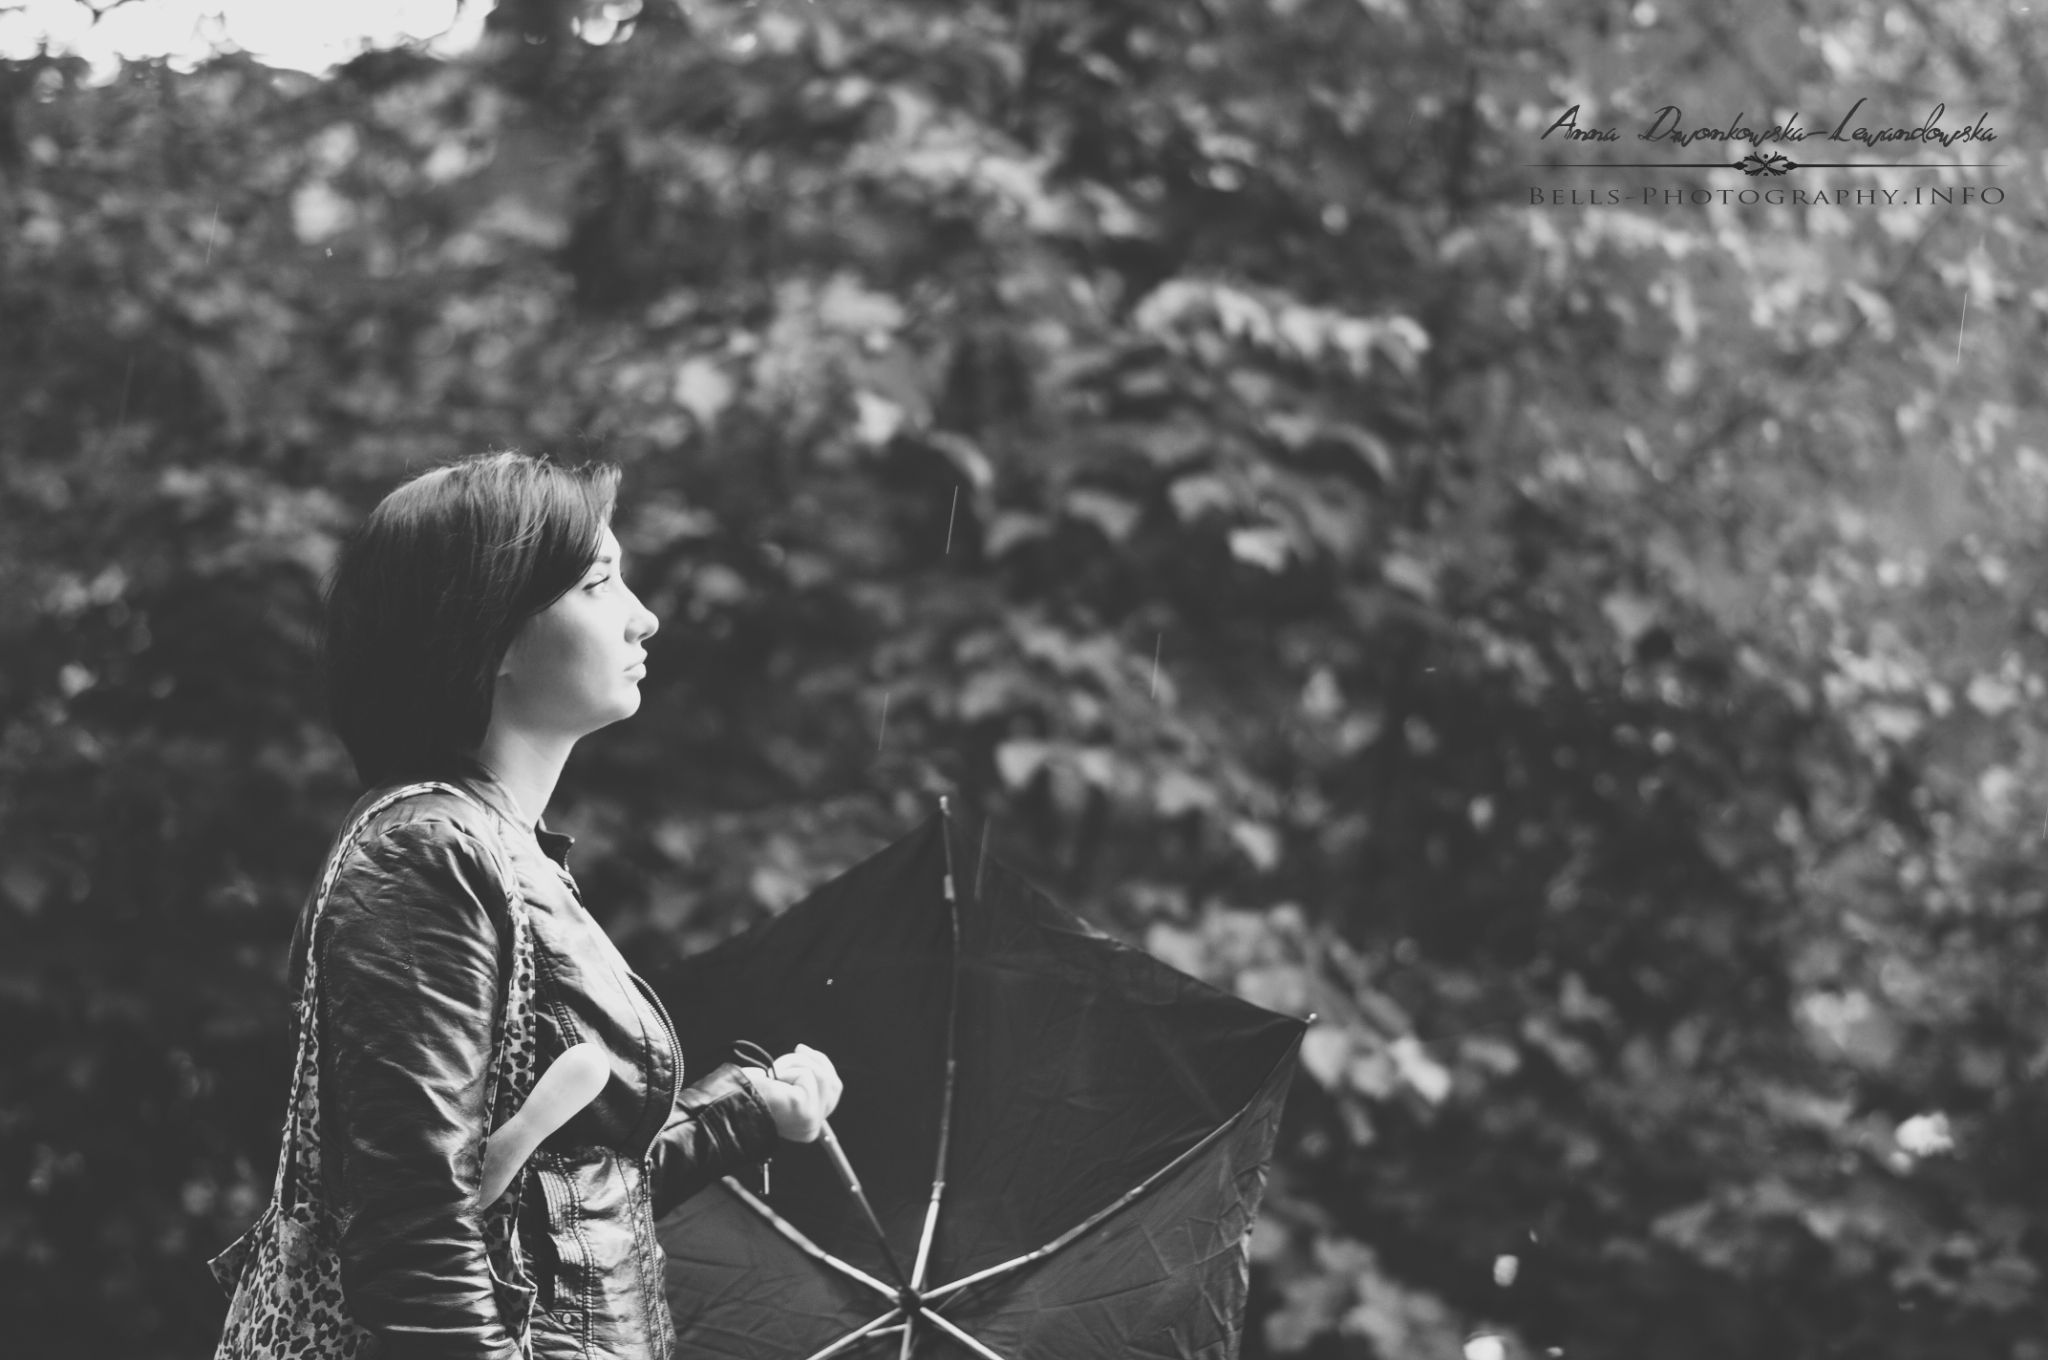 Anna by Anna Dzwonkowska-Lewandowska